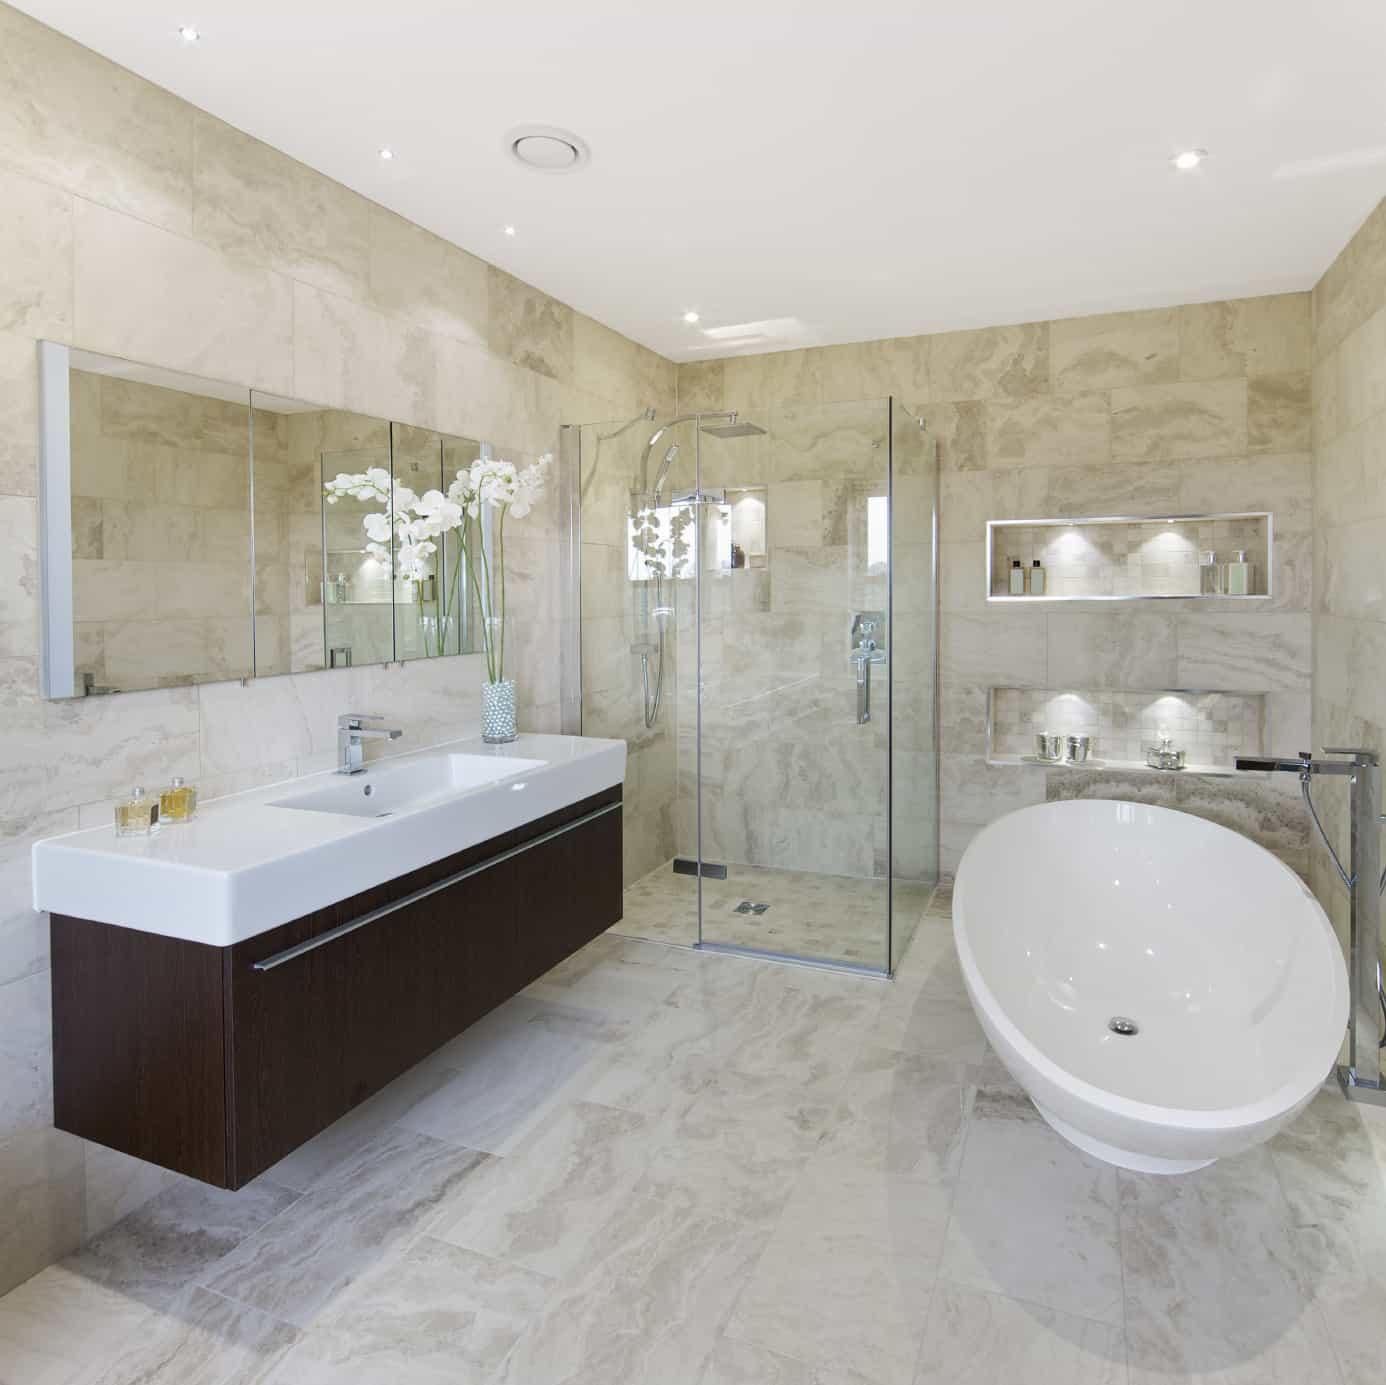 2019 Bathroom Ideas: 470 Medium-Sized Master Bathroom Ideas For 2019